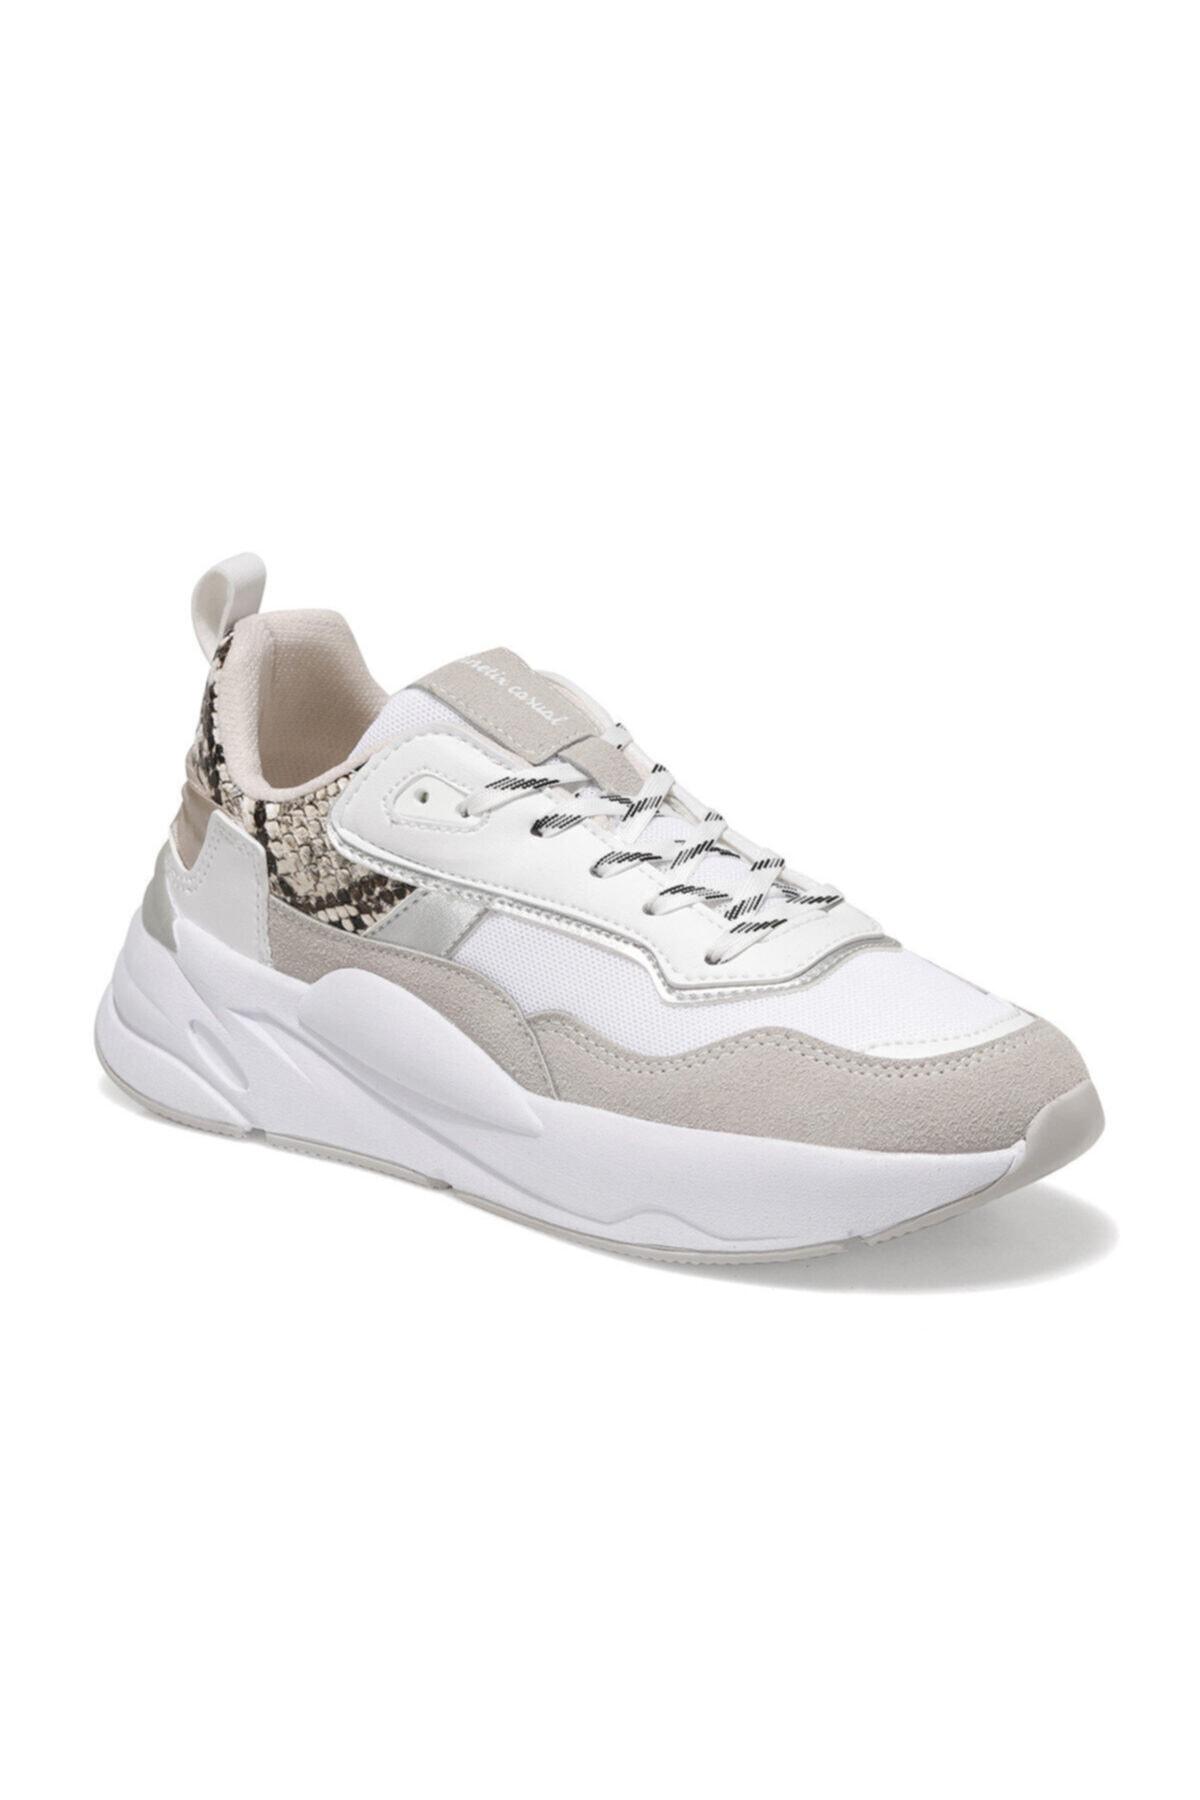 Kinetix BURGES Bej Kadın Fashion Sneaker 100540696 1